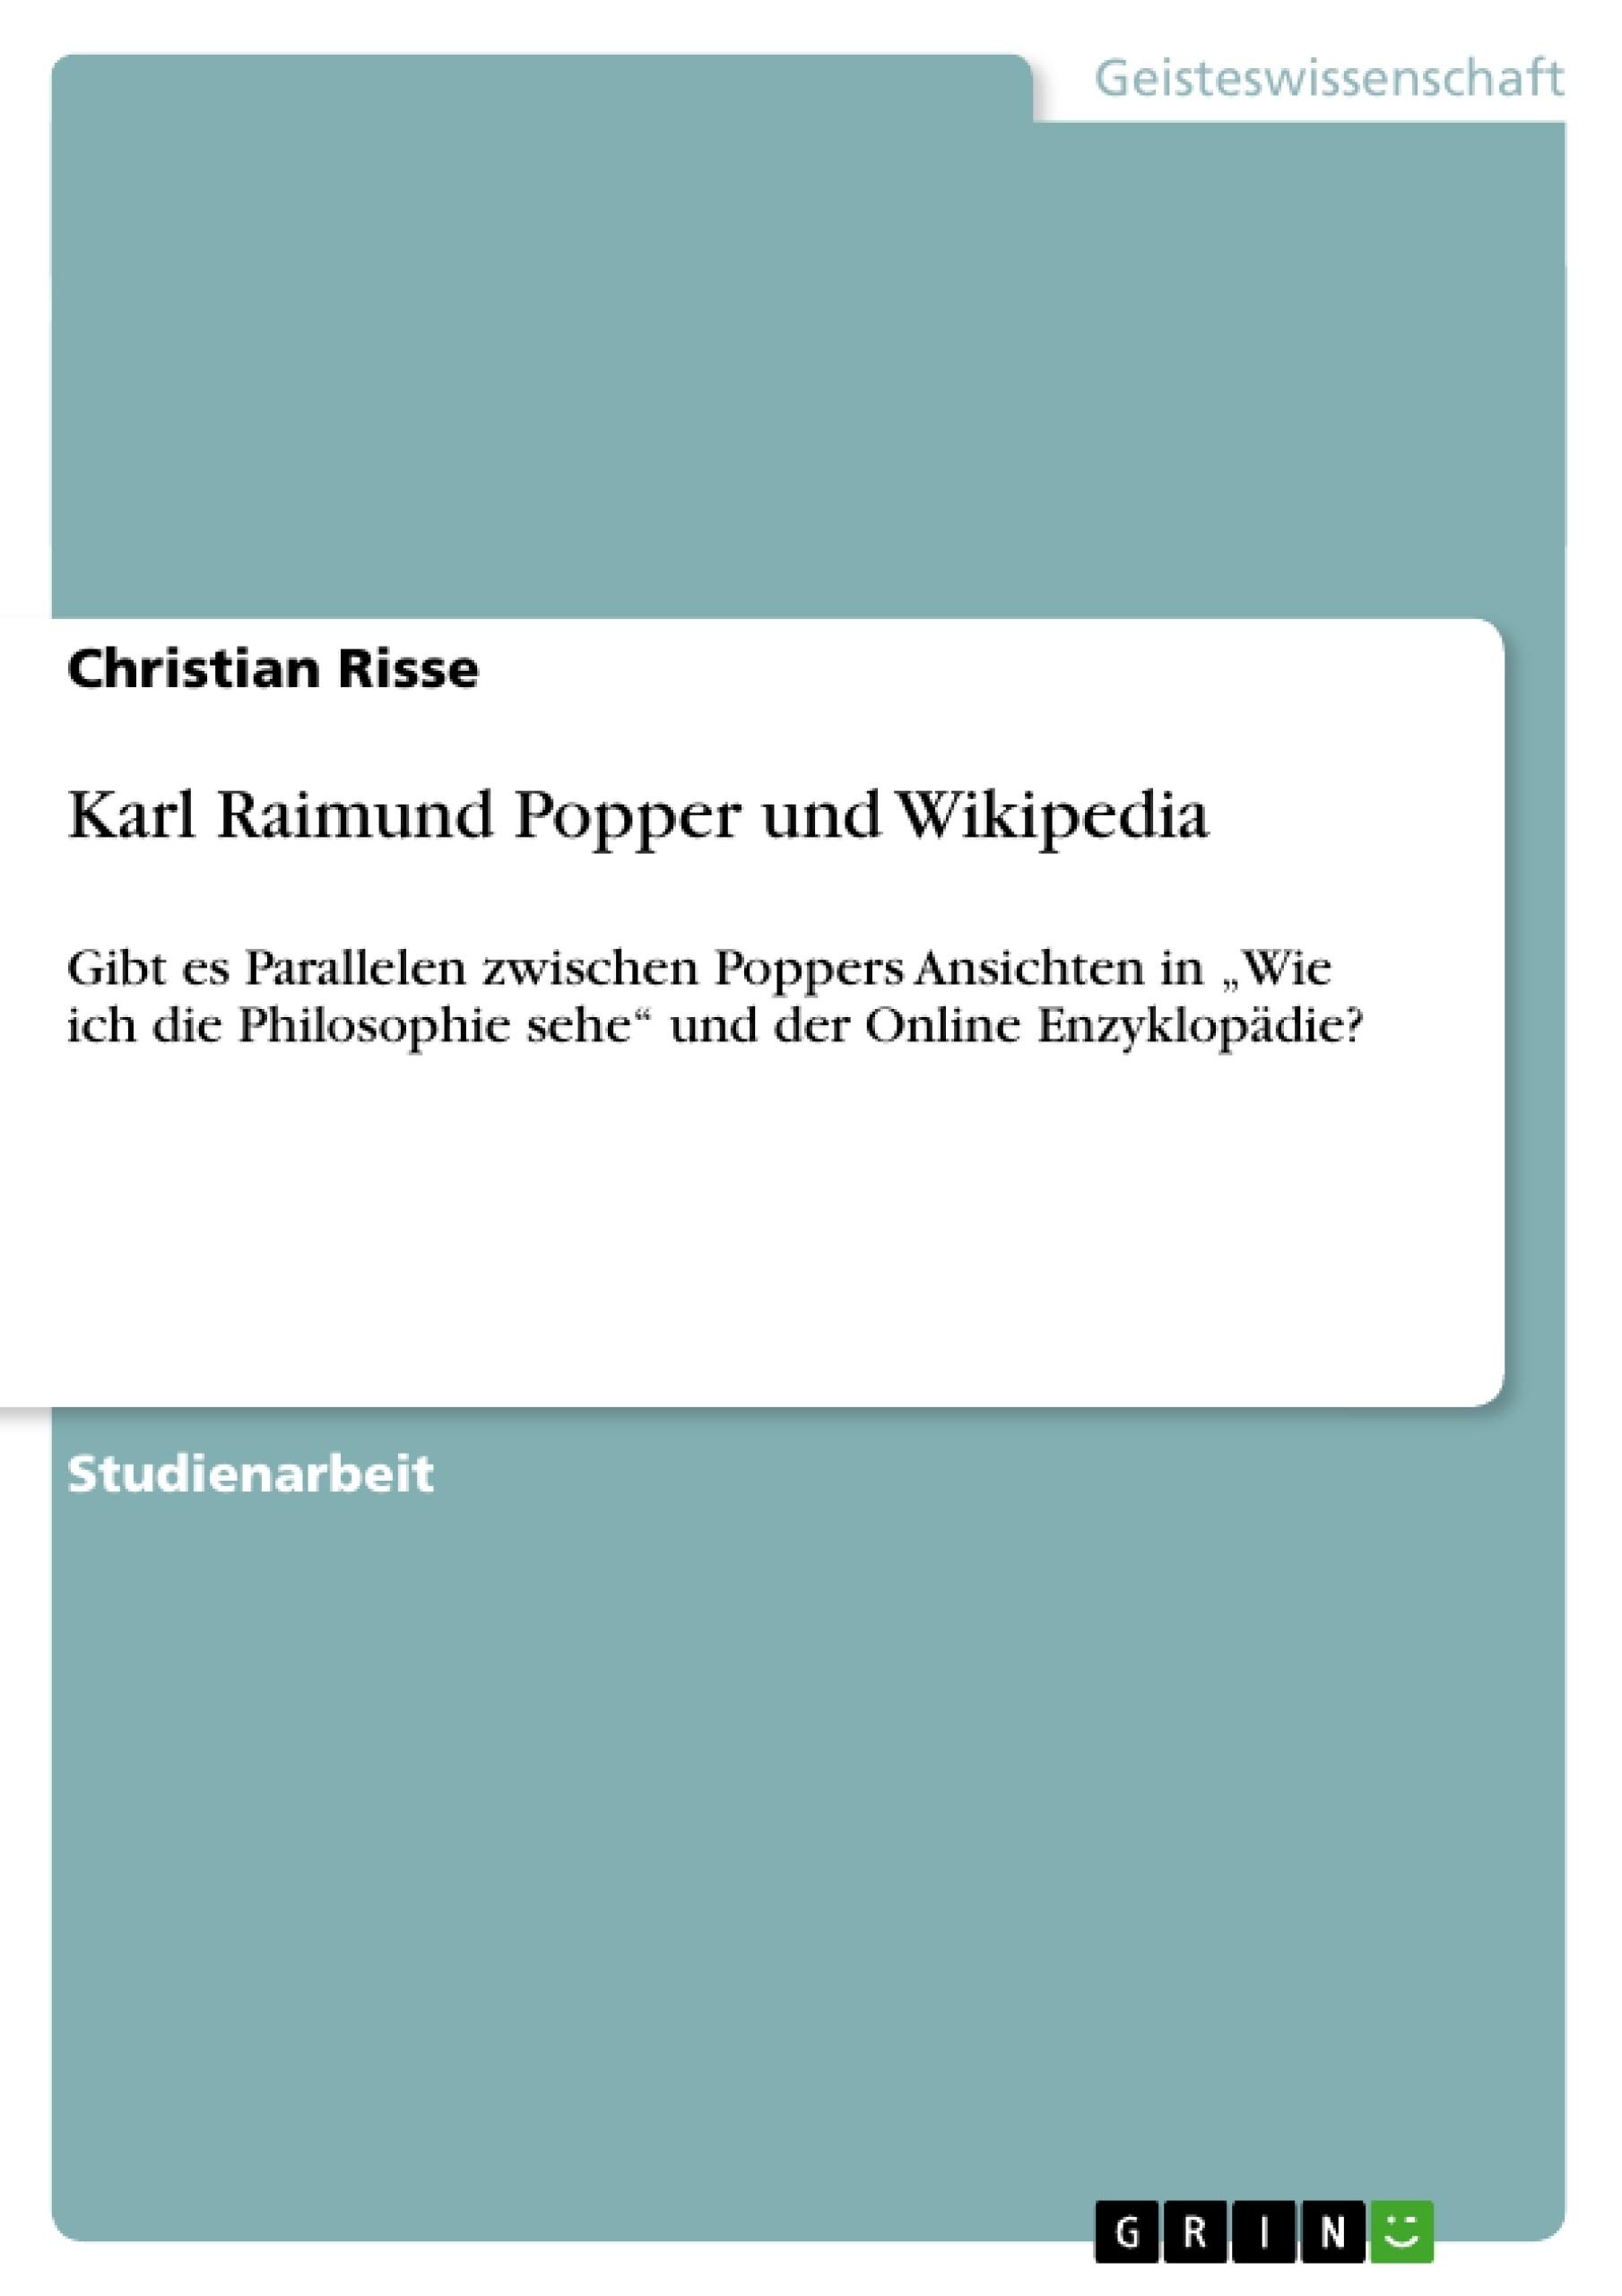 Titel: Karl Raimund Popper und Wikipedia